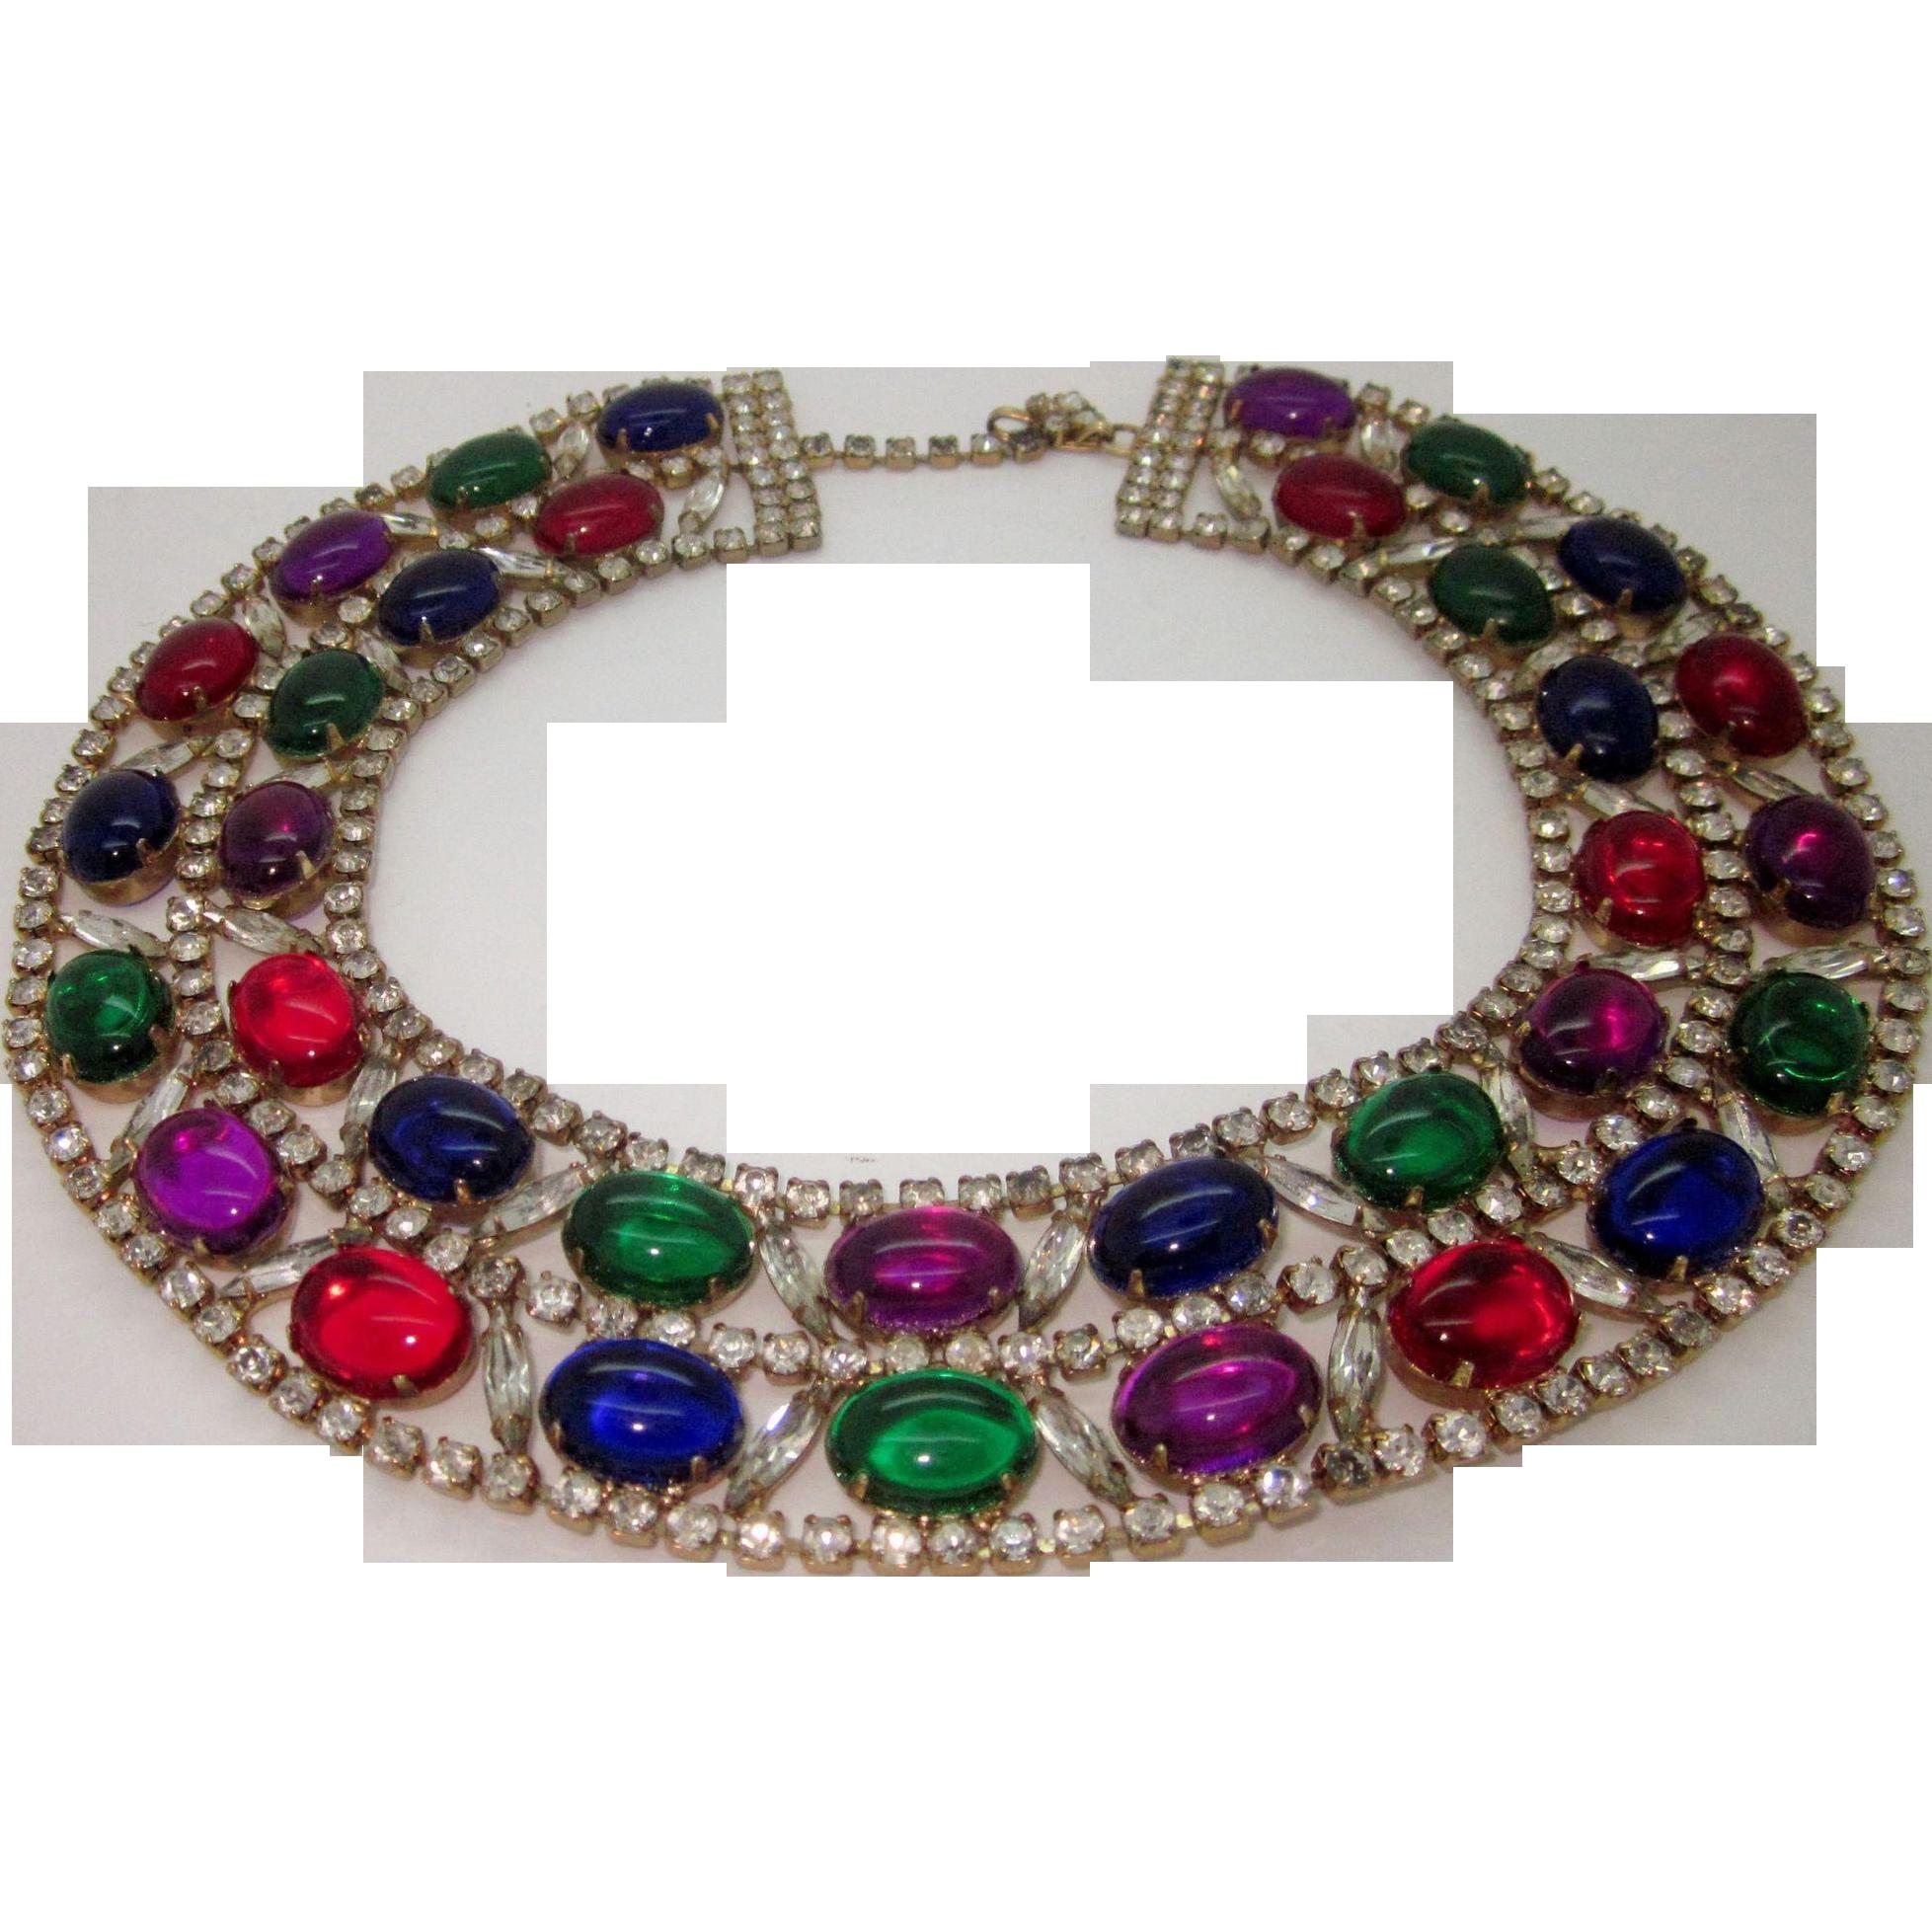 Vintage Collar Bib Necklace Jewel Tone Cabs and Icy Navette Rhinestones